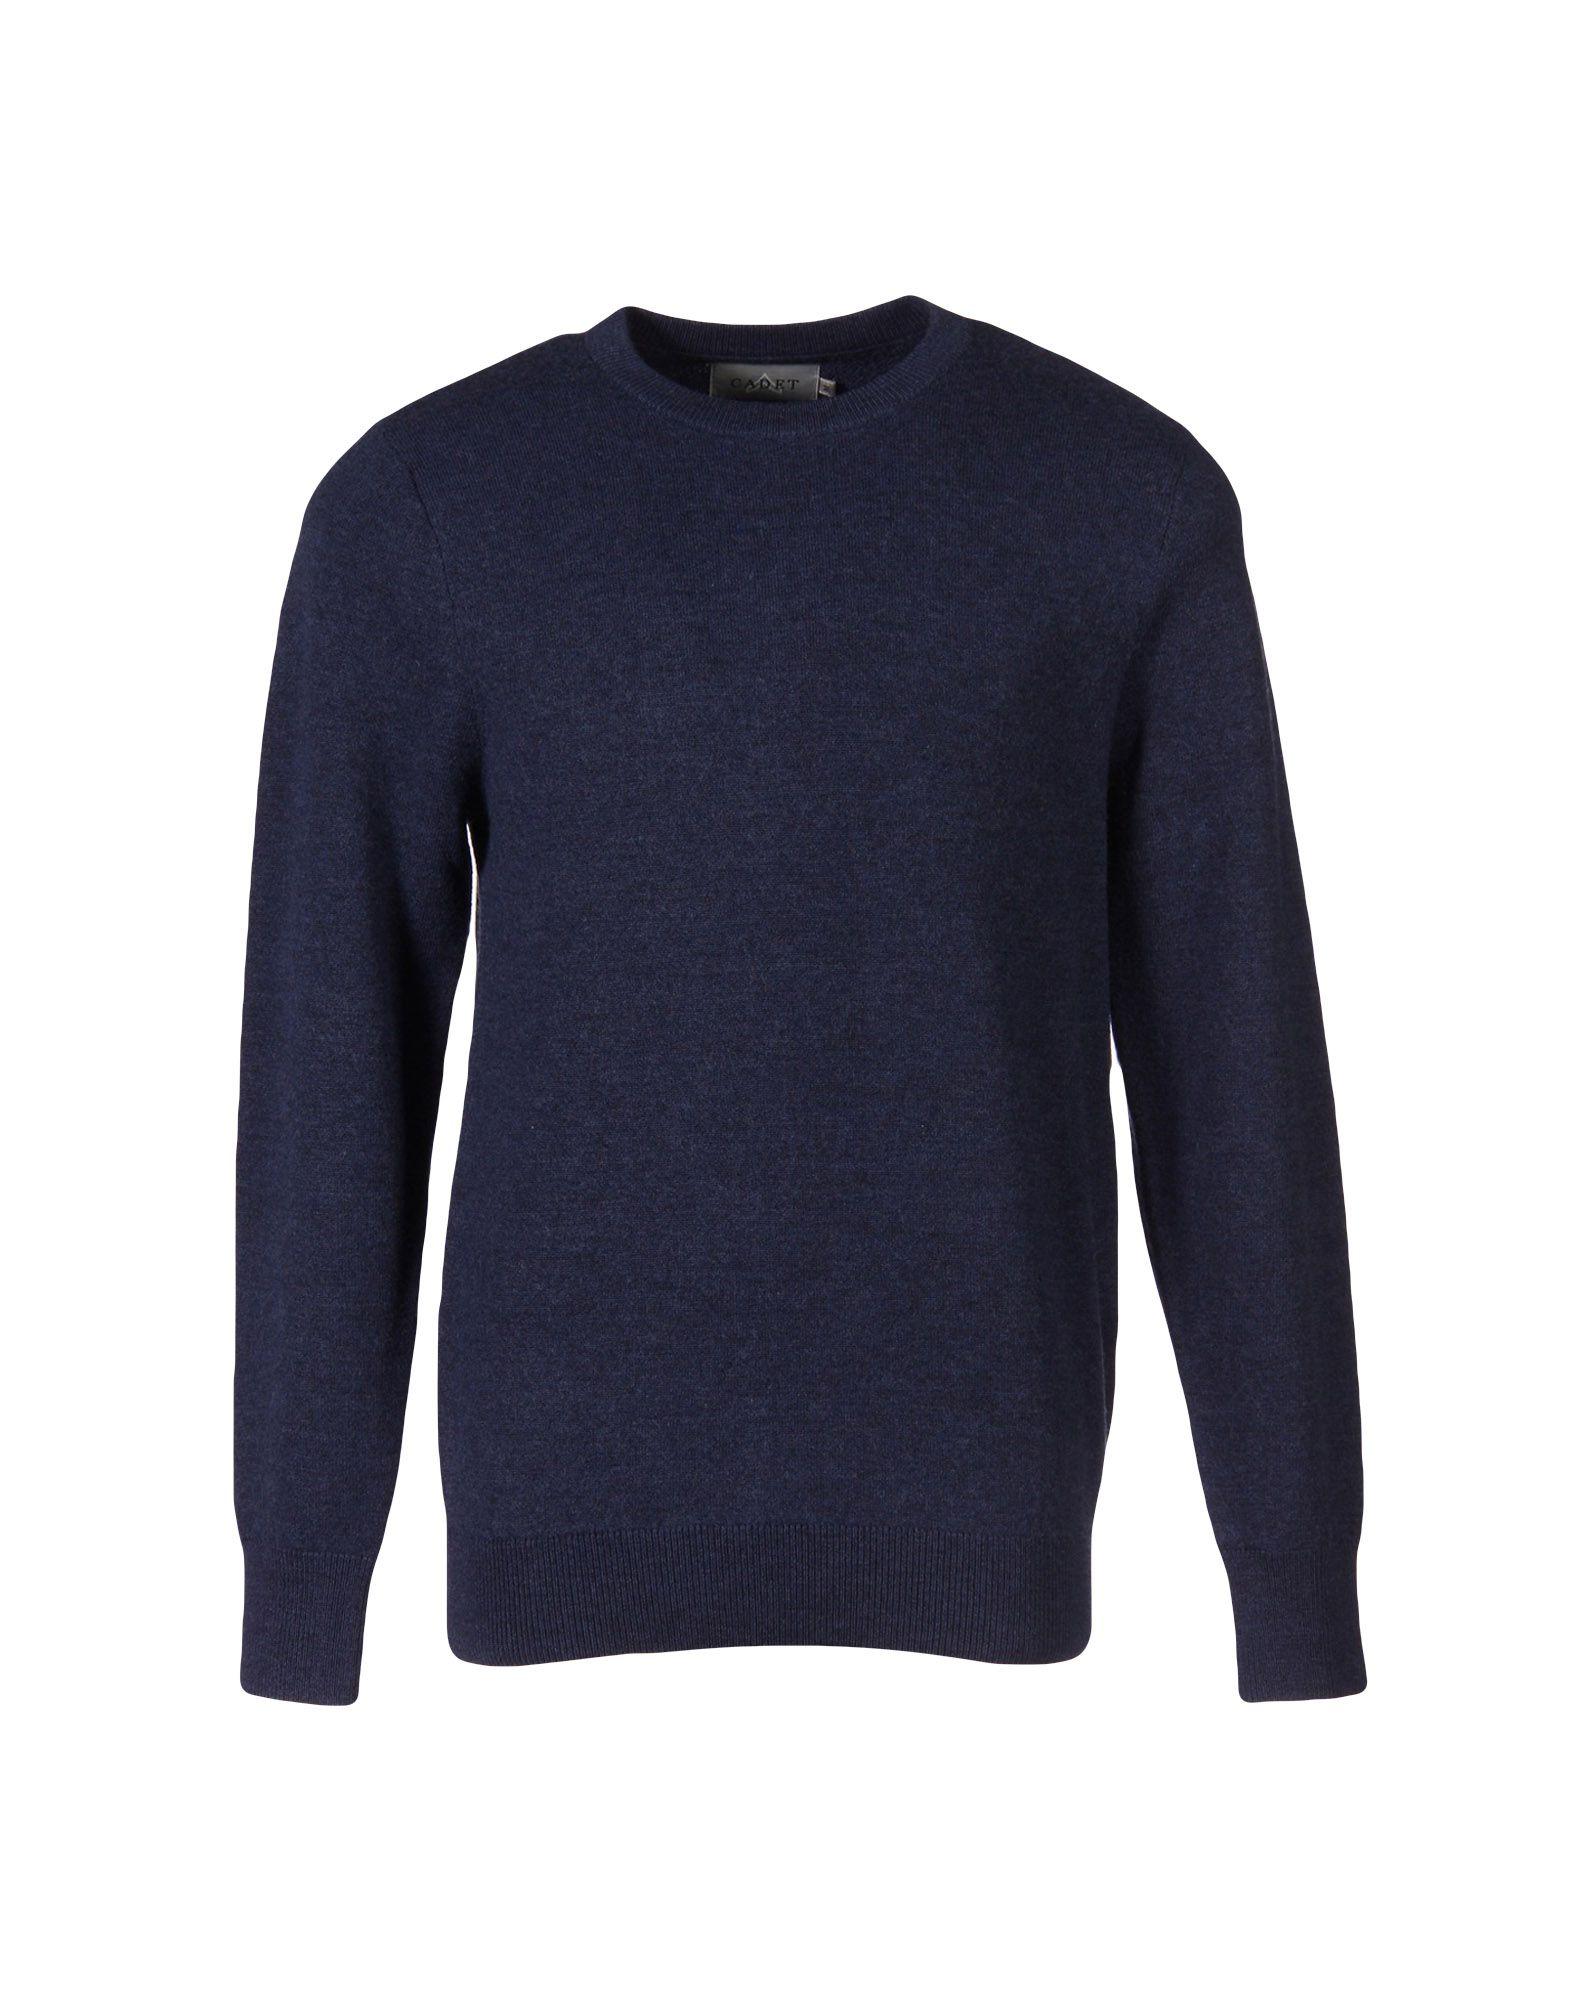 CADET Sweaters in Dark Blue